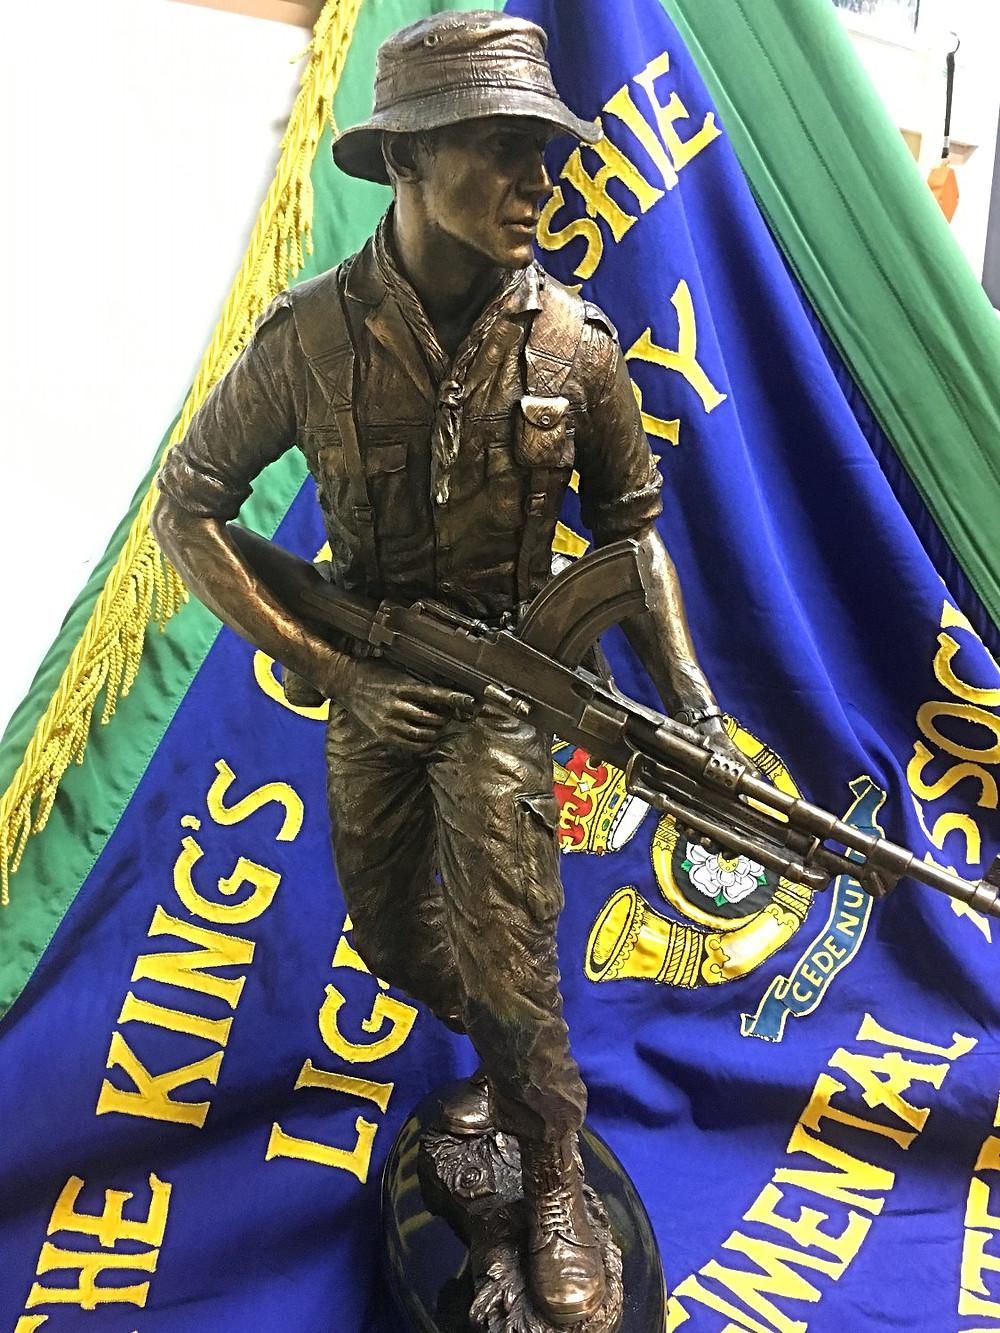 Maquette of KOYLI Memorial Statue on a KOYLI Standard